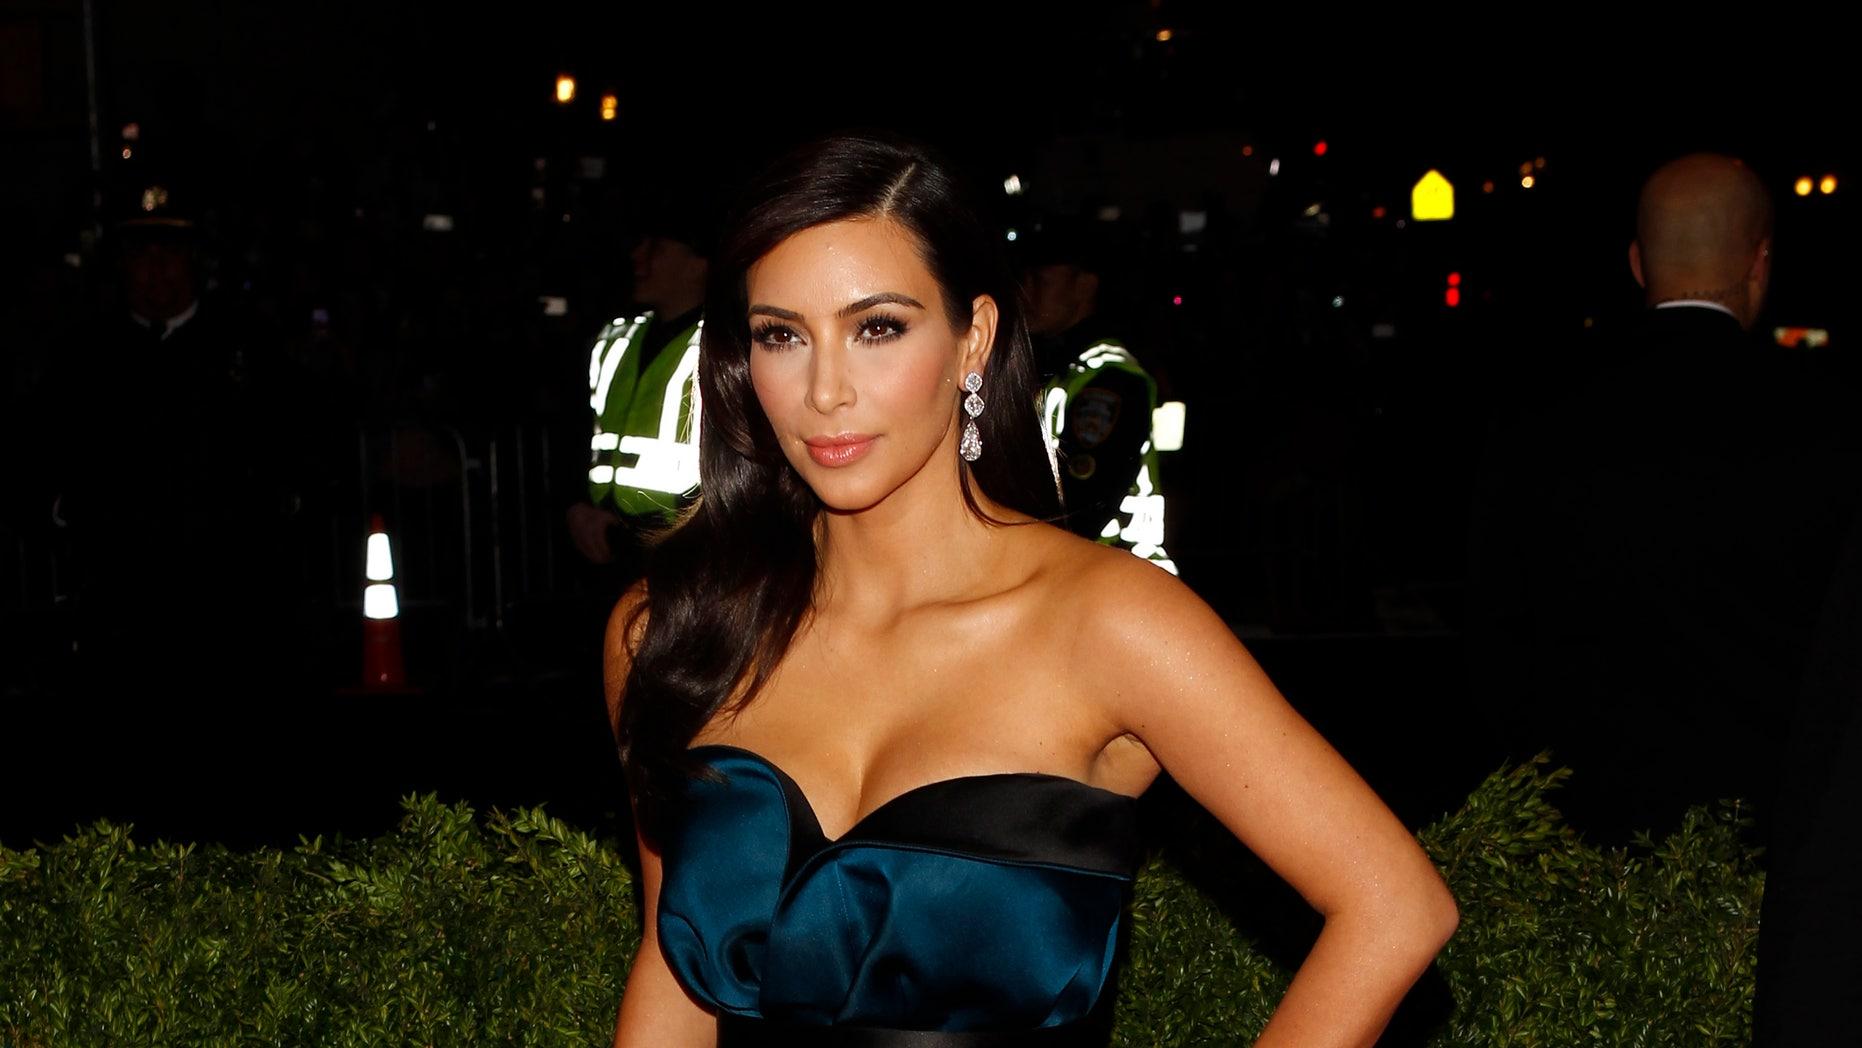 May 5, 2014. Kim Kardashian arrives at the Metropolitan Museum of Art Costume Institute Gala Benefit in New York.